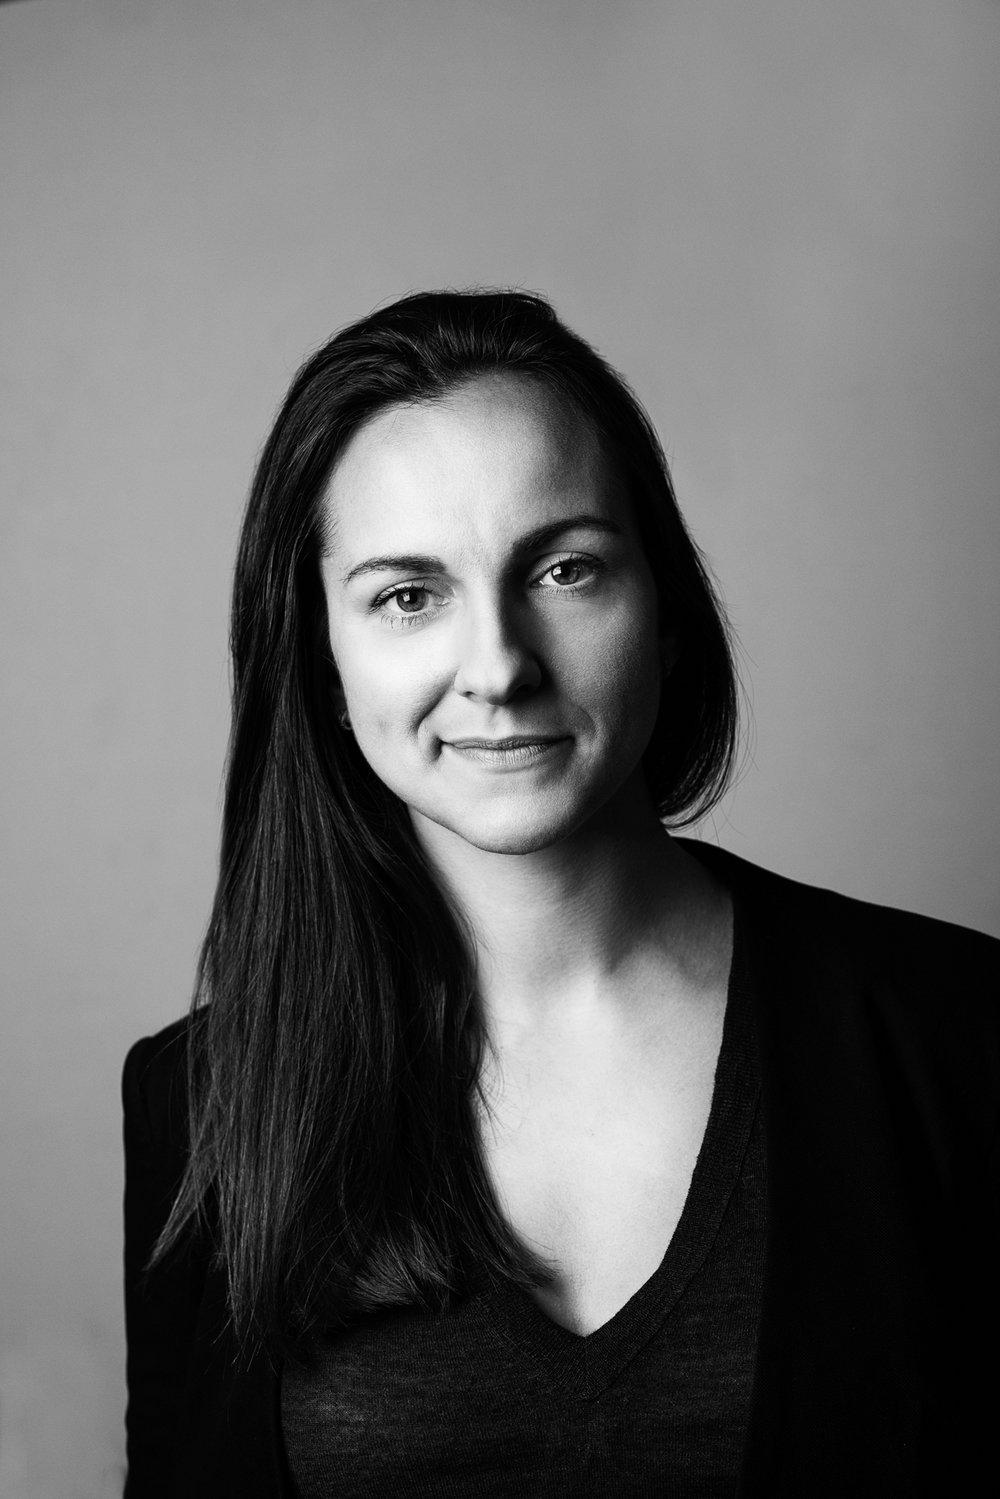 <span>Marta Sjögren (SWE)</span><span>Northzone</span>